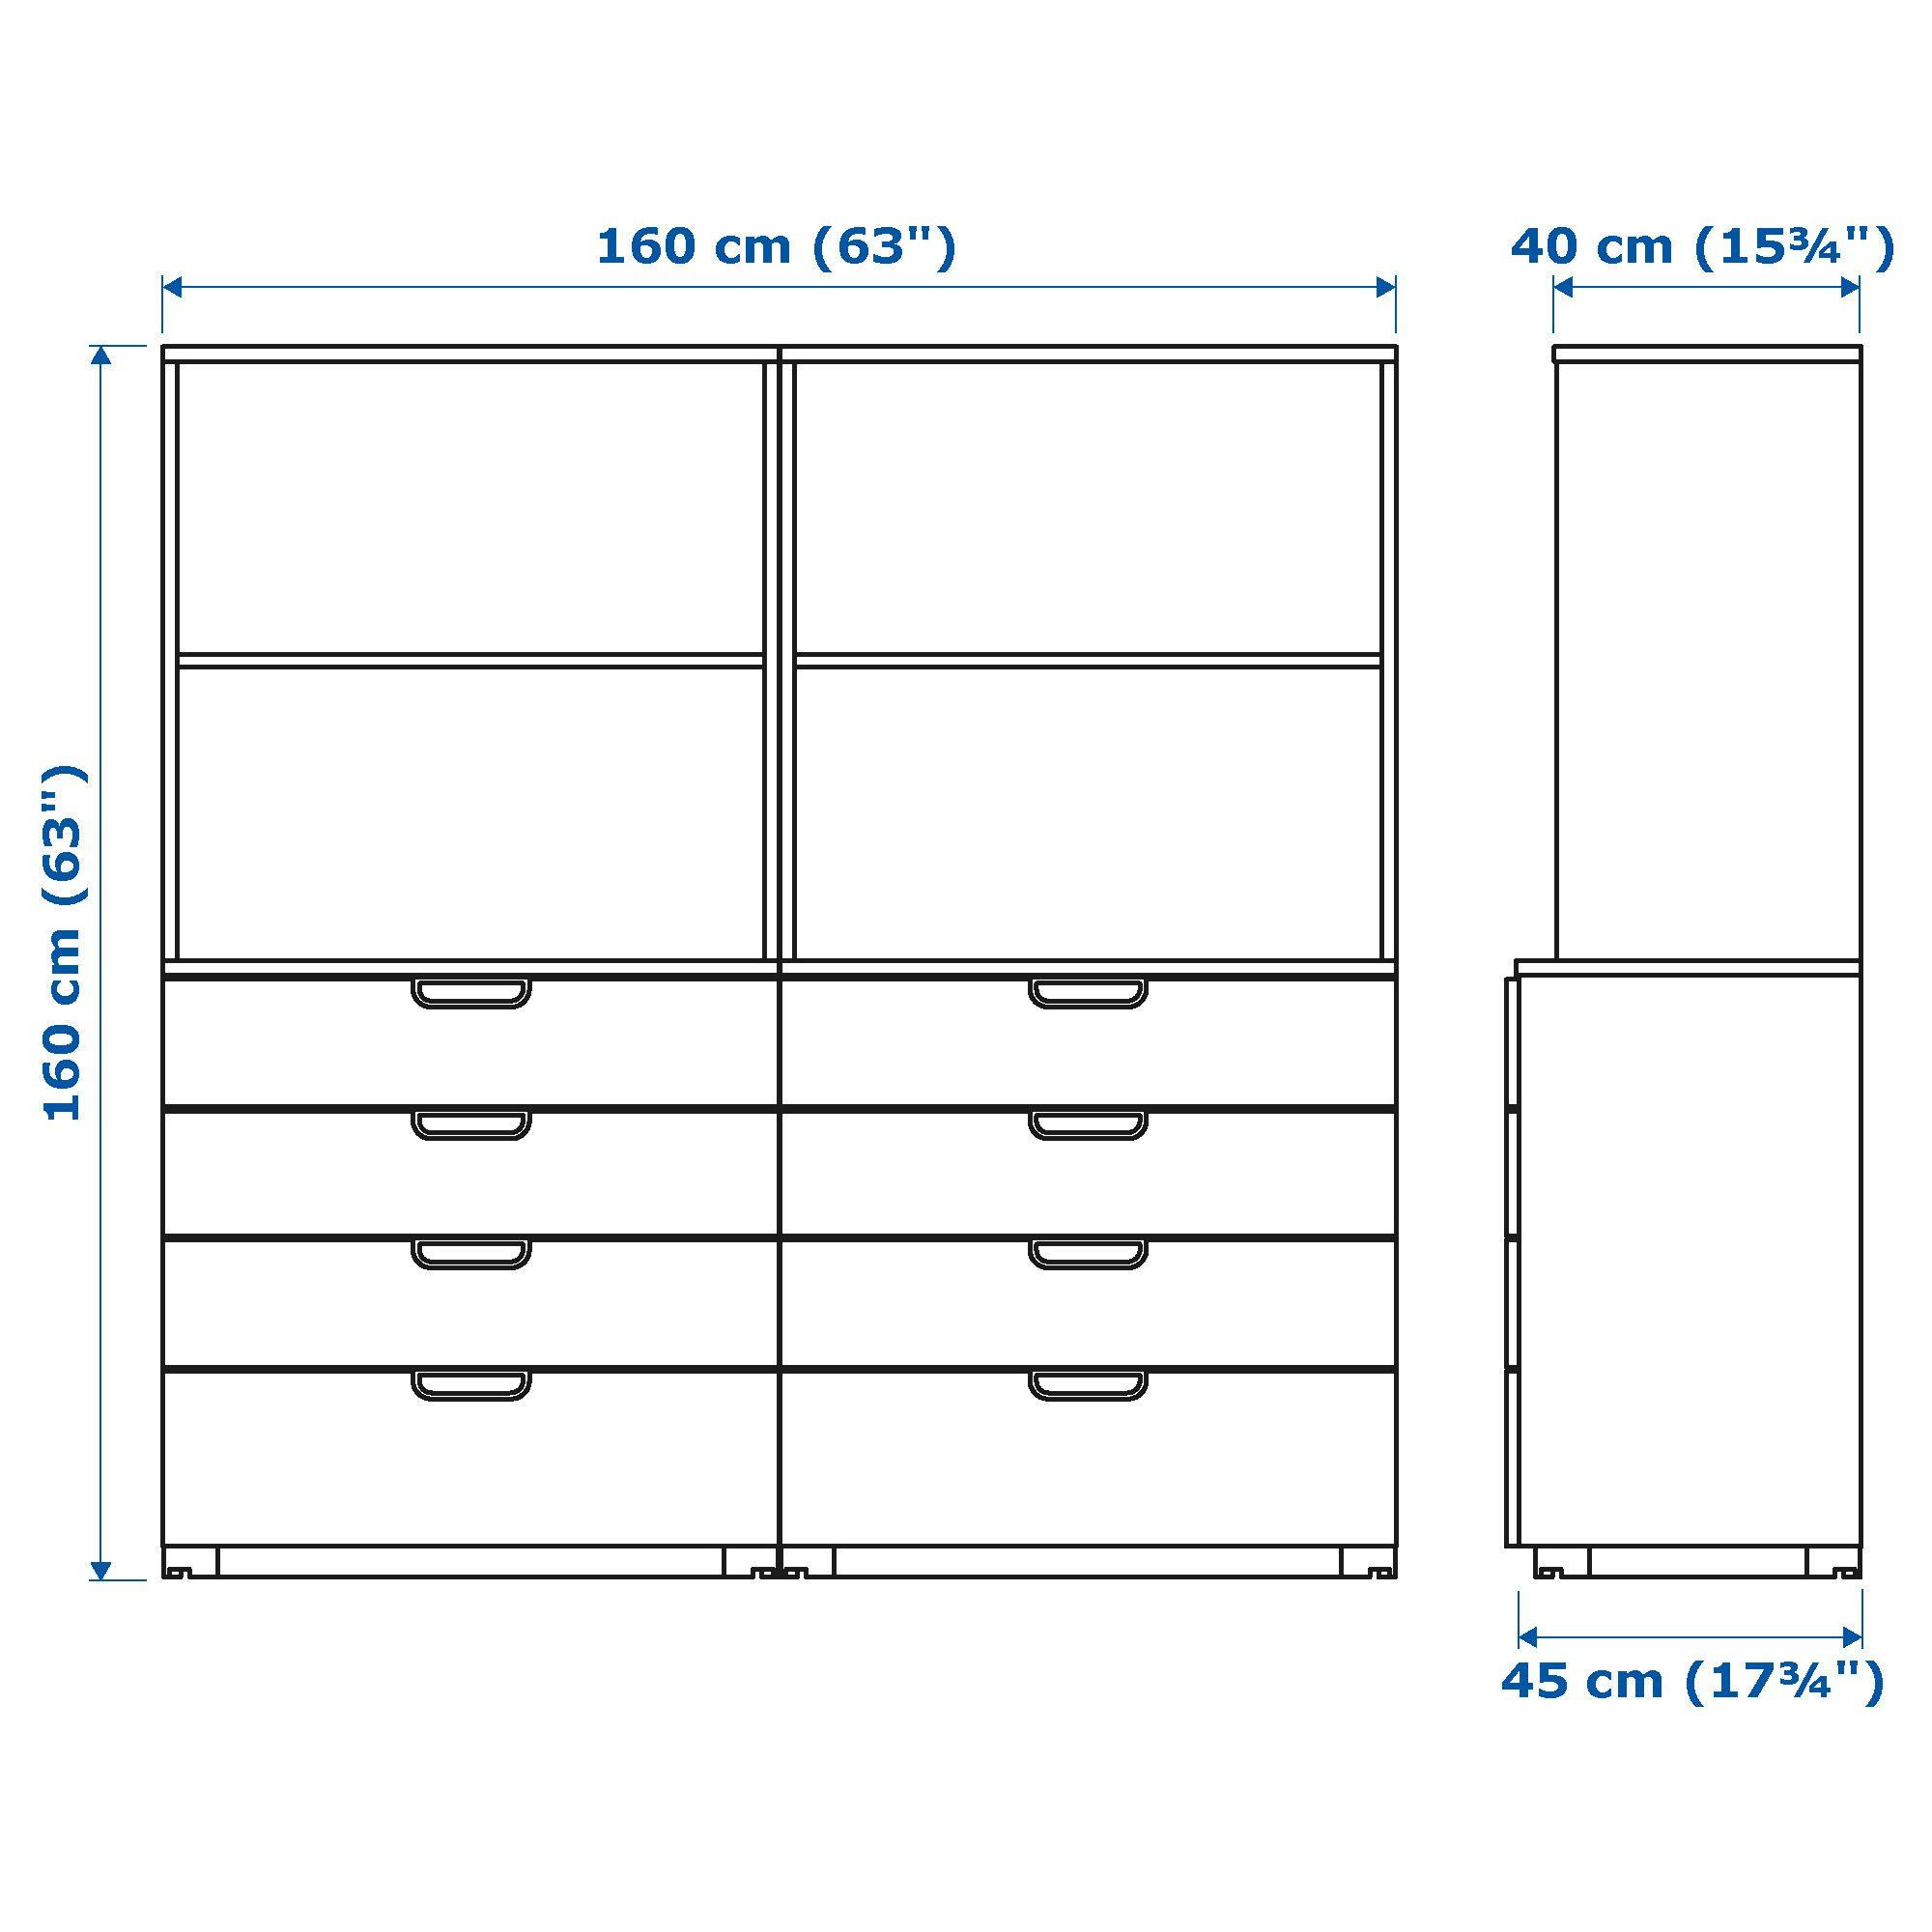 Galant Cabinets Display Cabinets Ikea In 2020 Ikea Cabinets Furniture Ikea